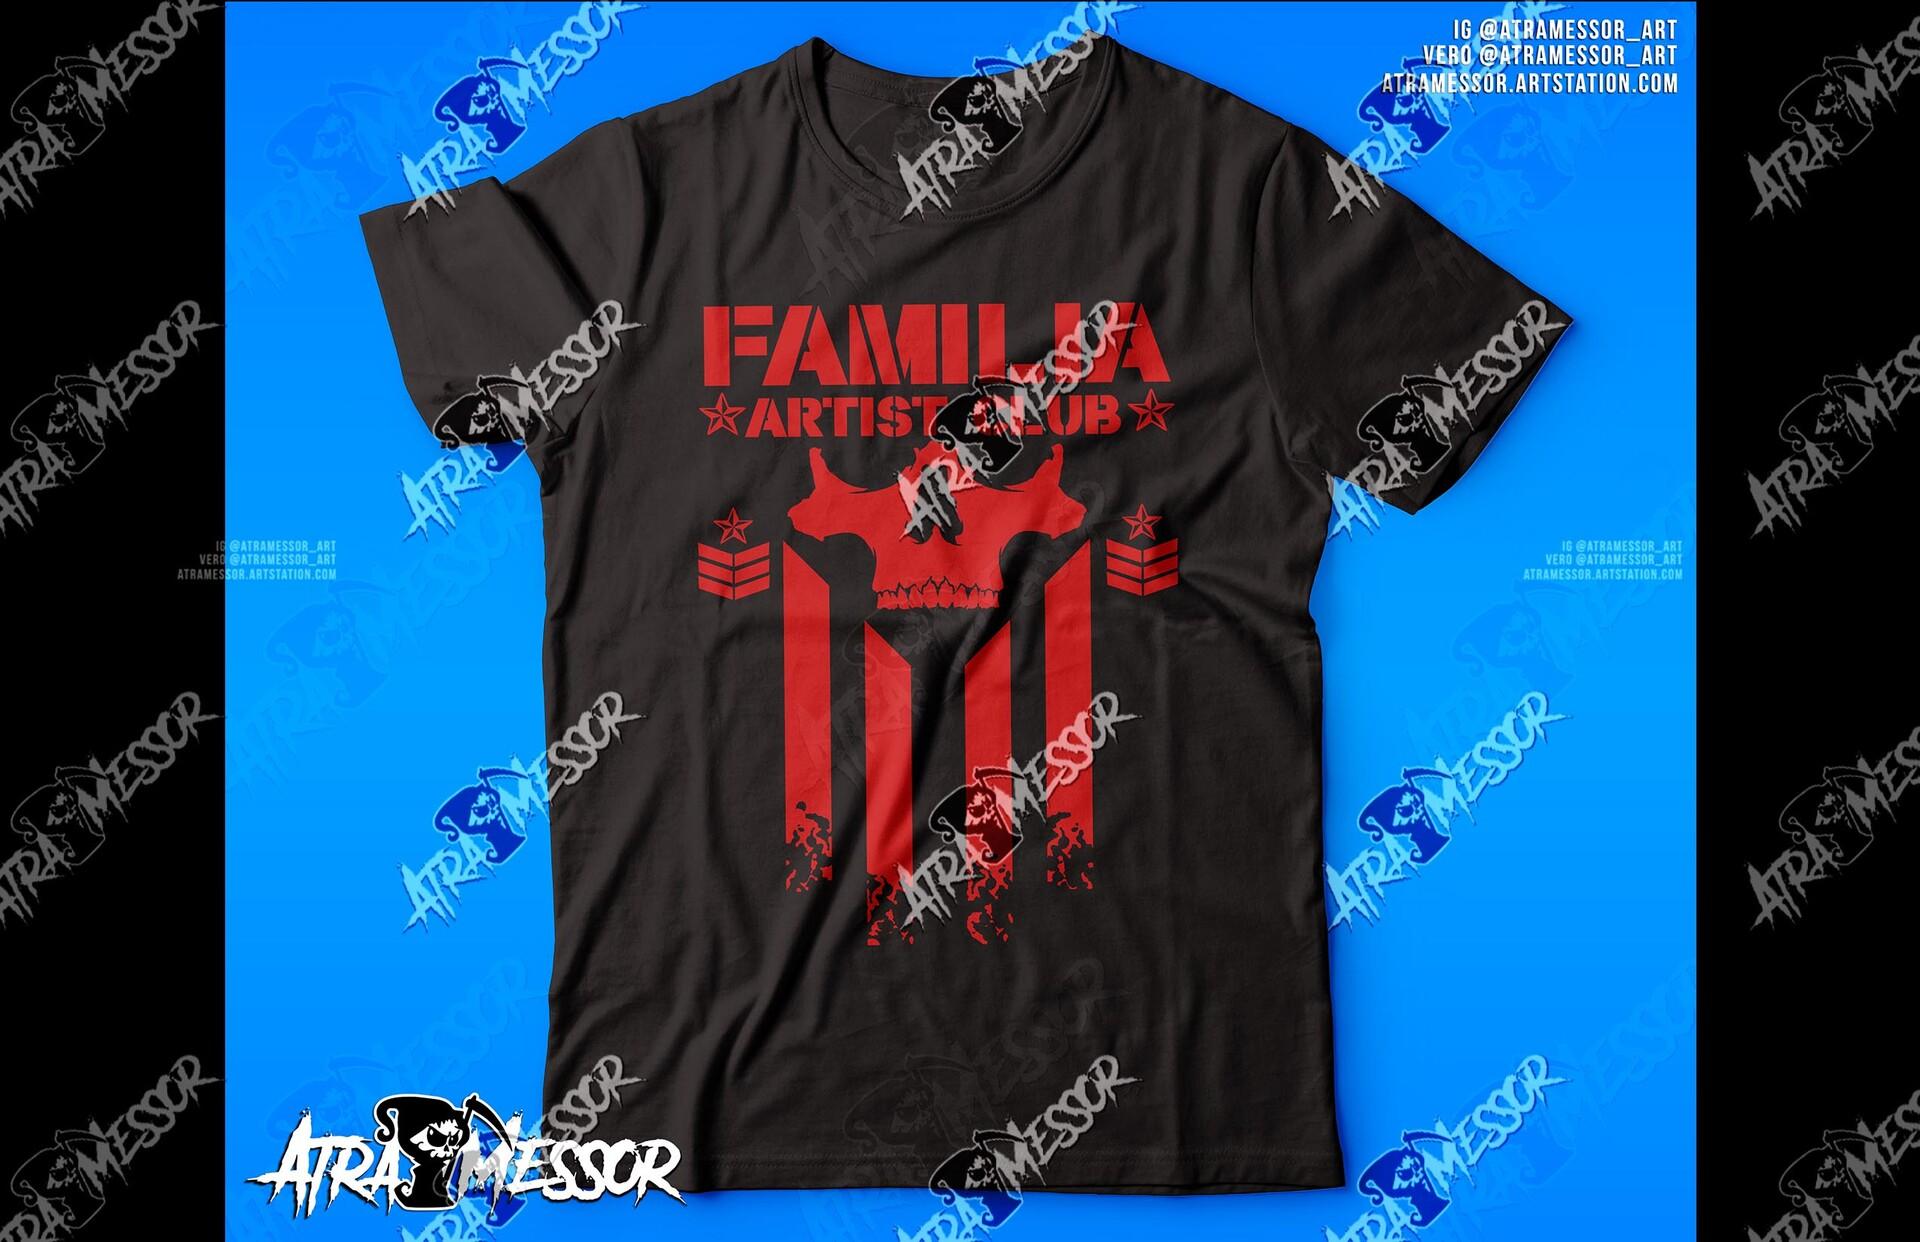 "Artist Club ""familia"" (Resistance Edition)"